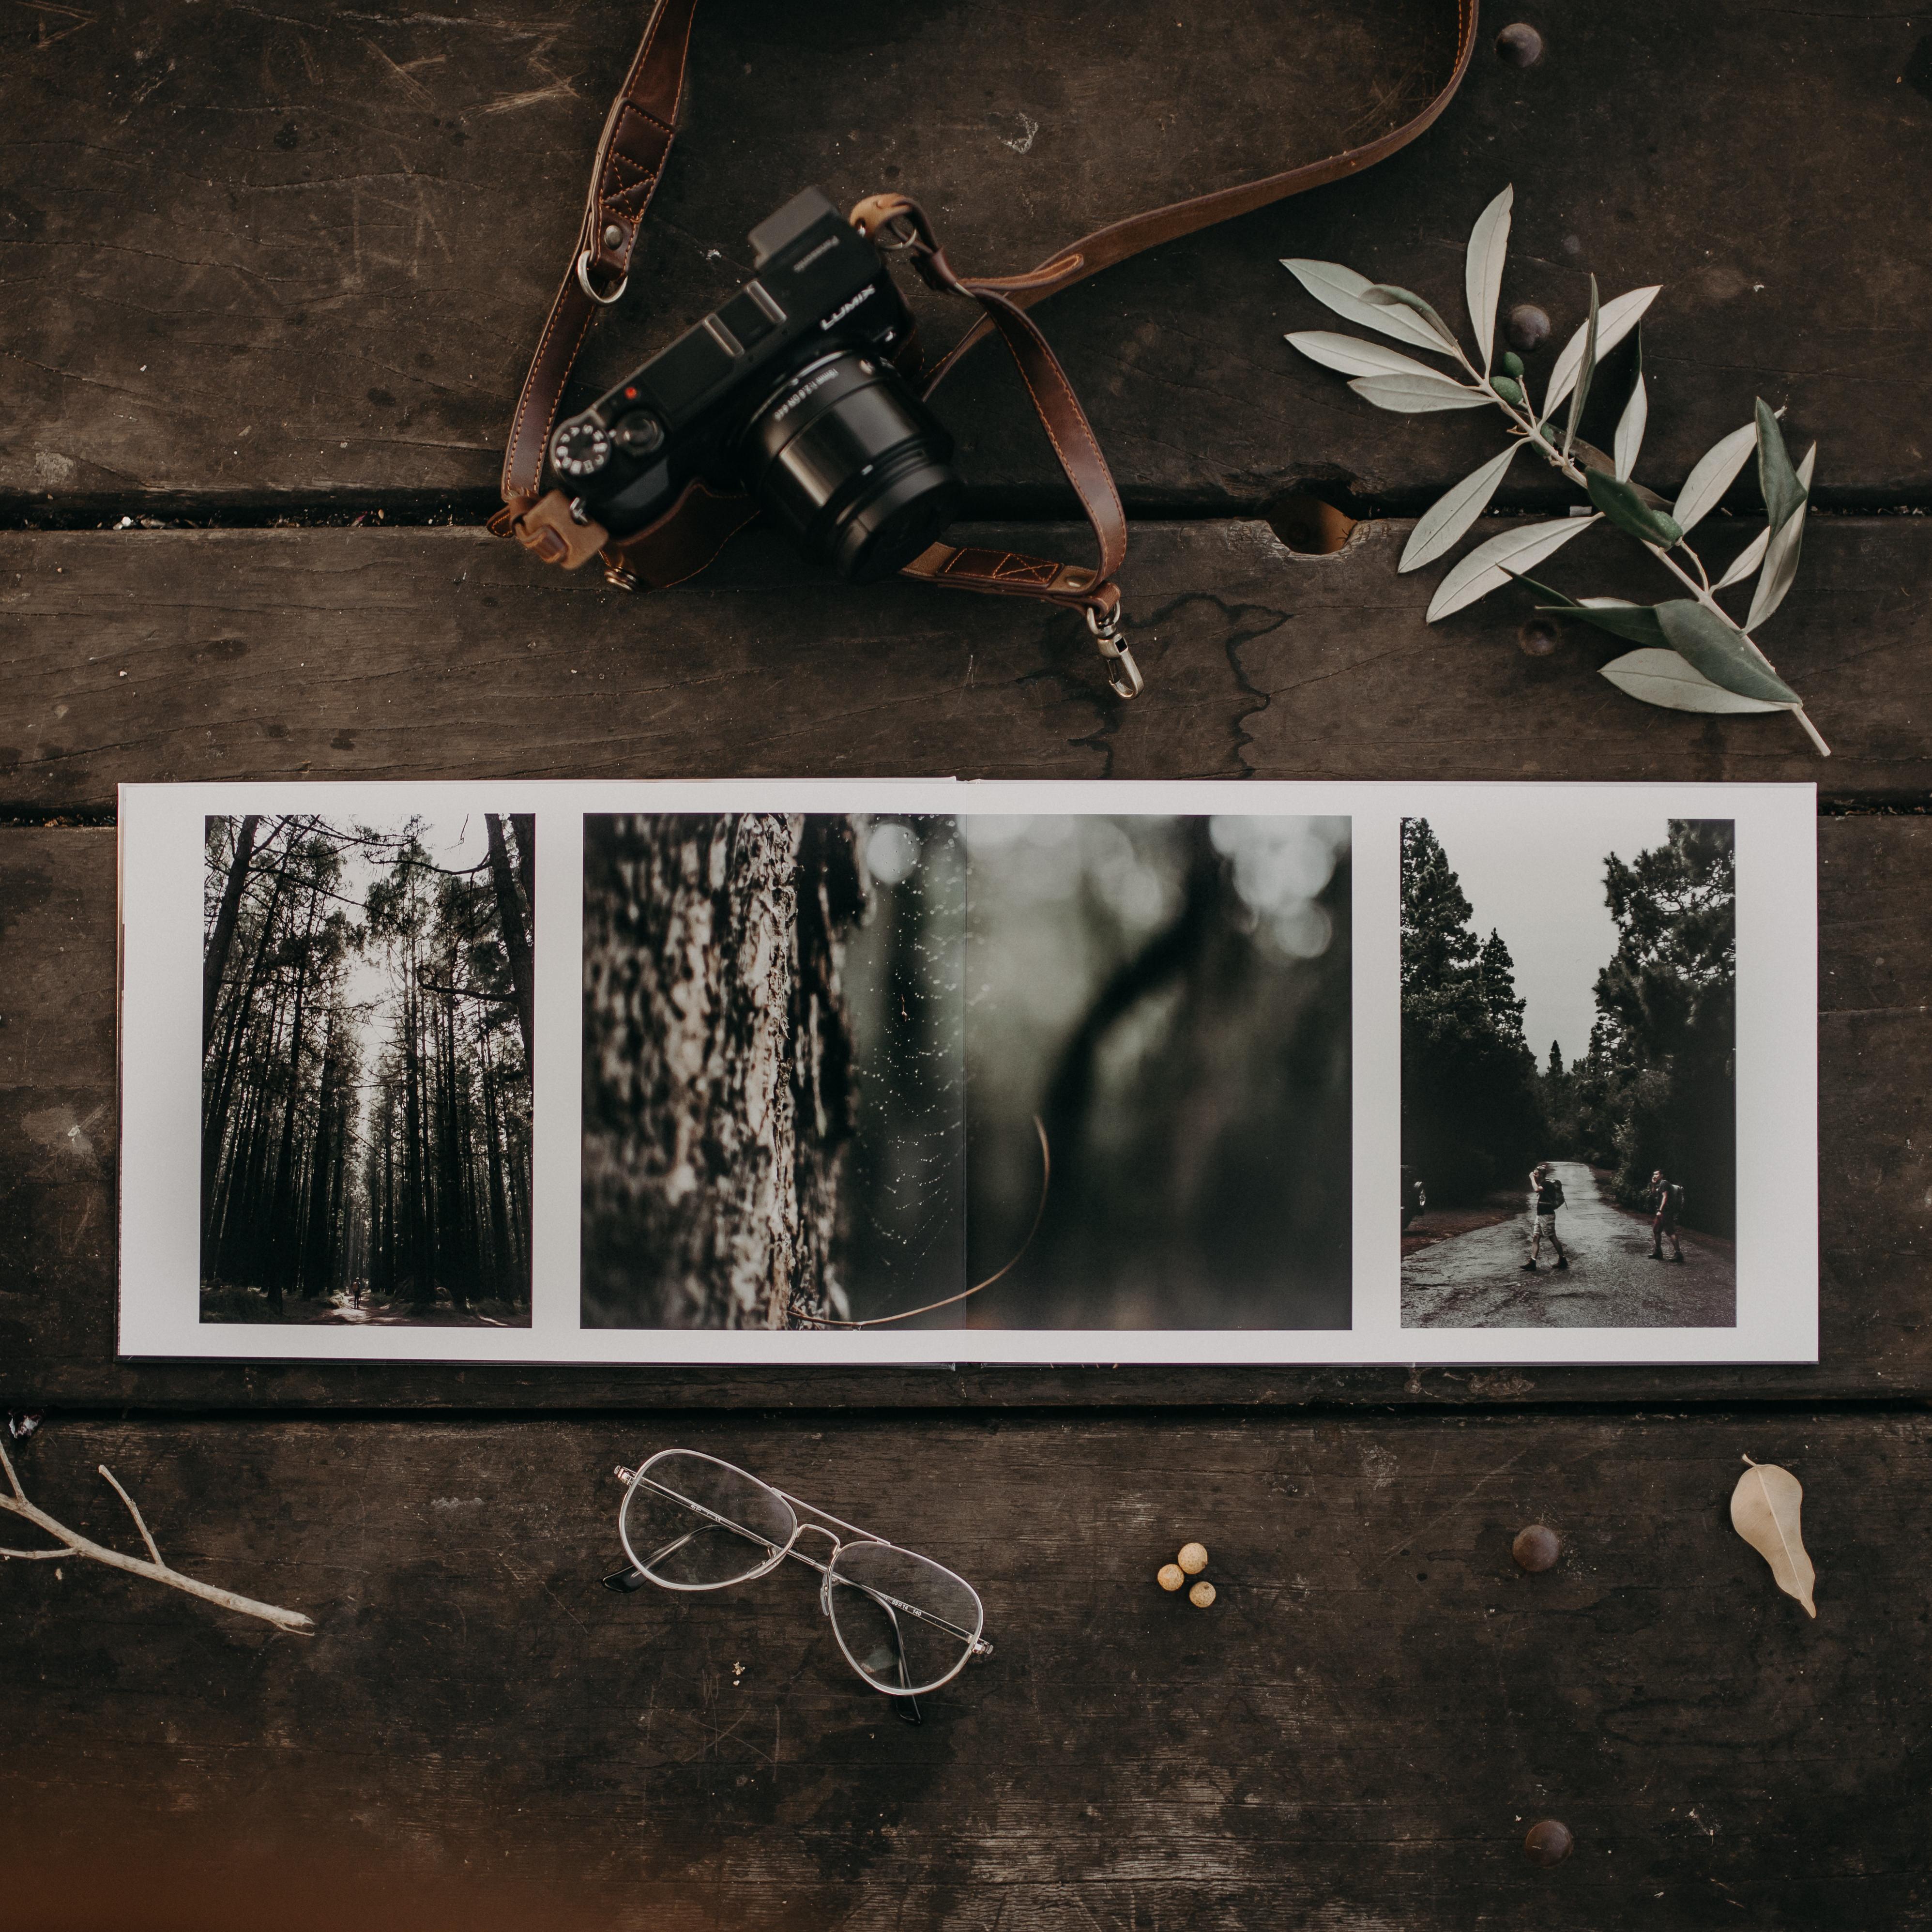 duke fotografia, fotografia, canarias, tienda de fotografia, las palmas, tienda online, blog de fotografía, israel gonzalez, isr4el, lifestyle, skoda canarias,